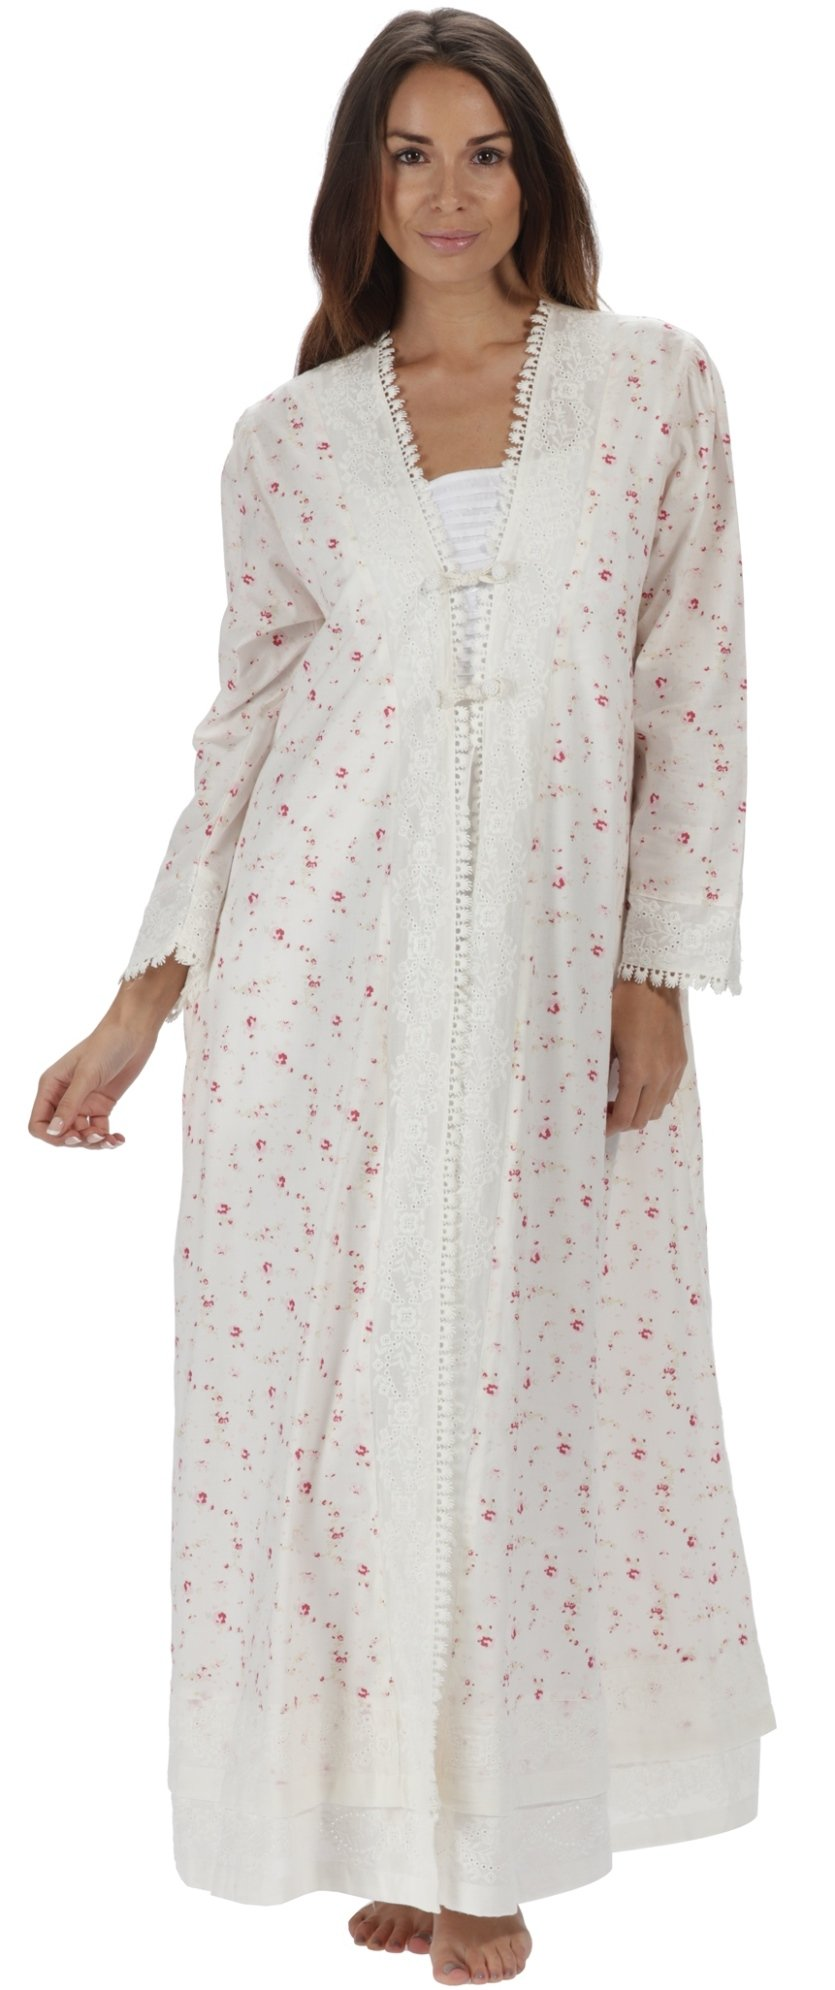 The 1 for U 100% Cotton Ladies Robe/Housecoat - Rosalind (XL, Vintage Rose)